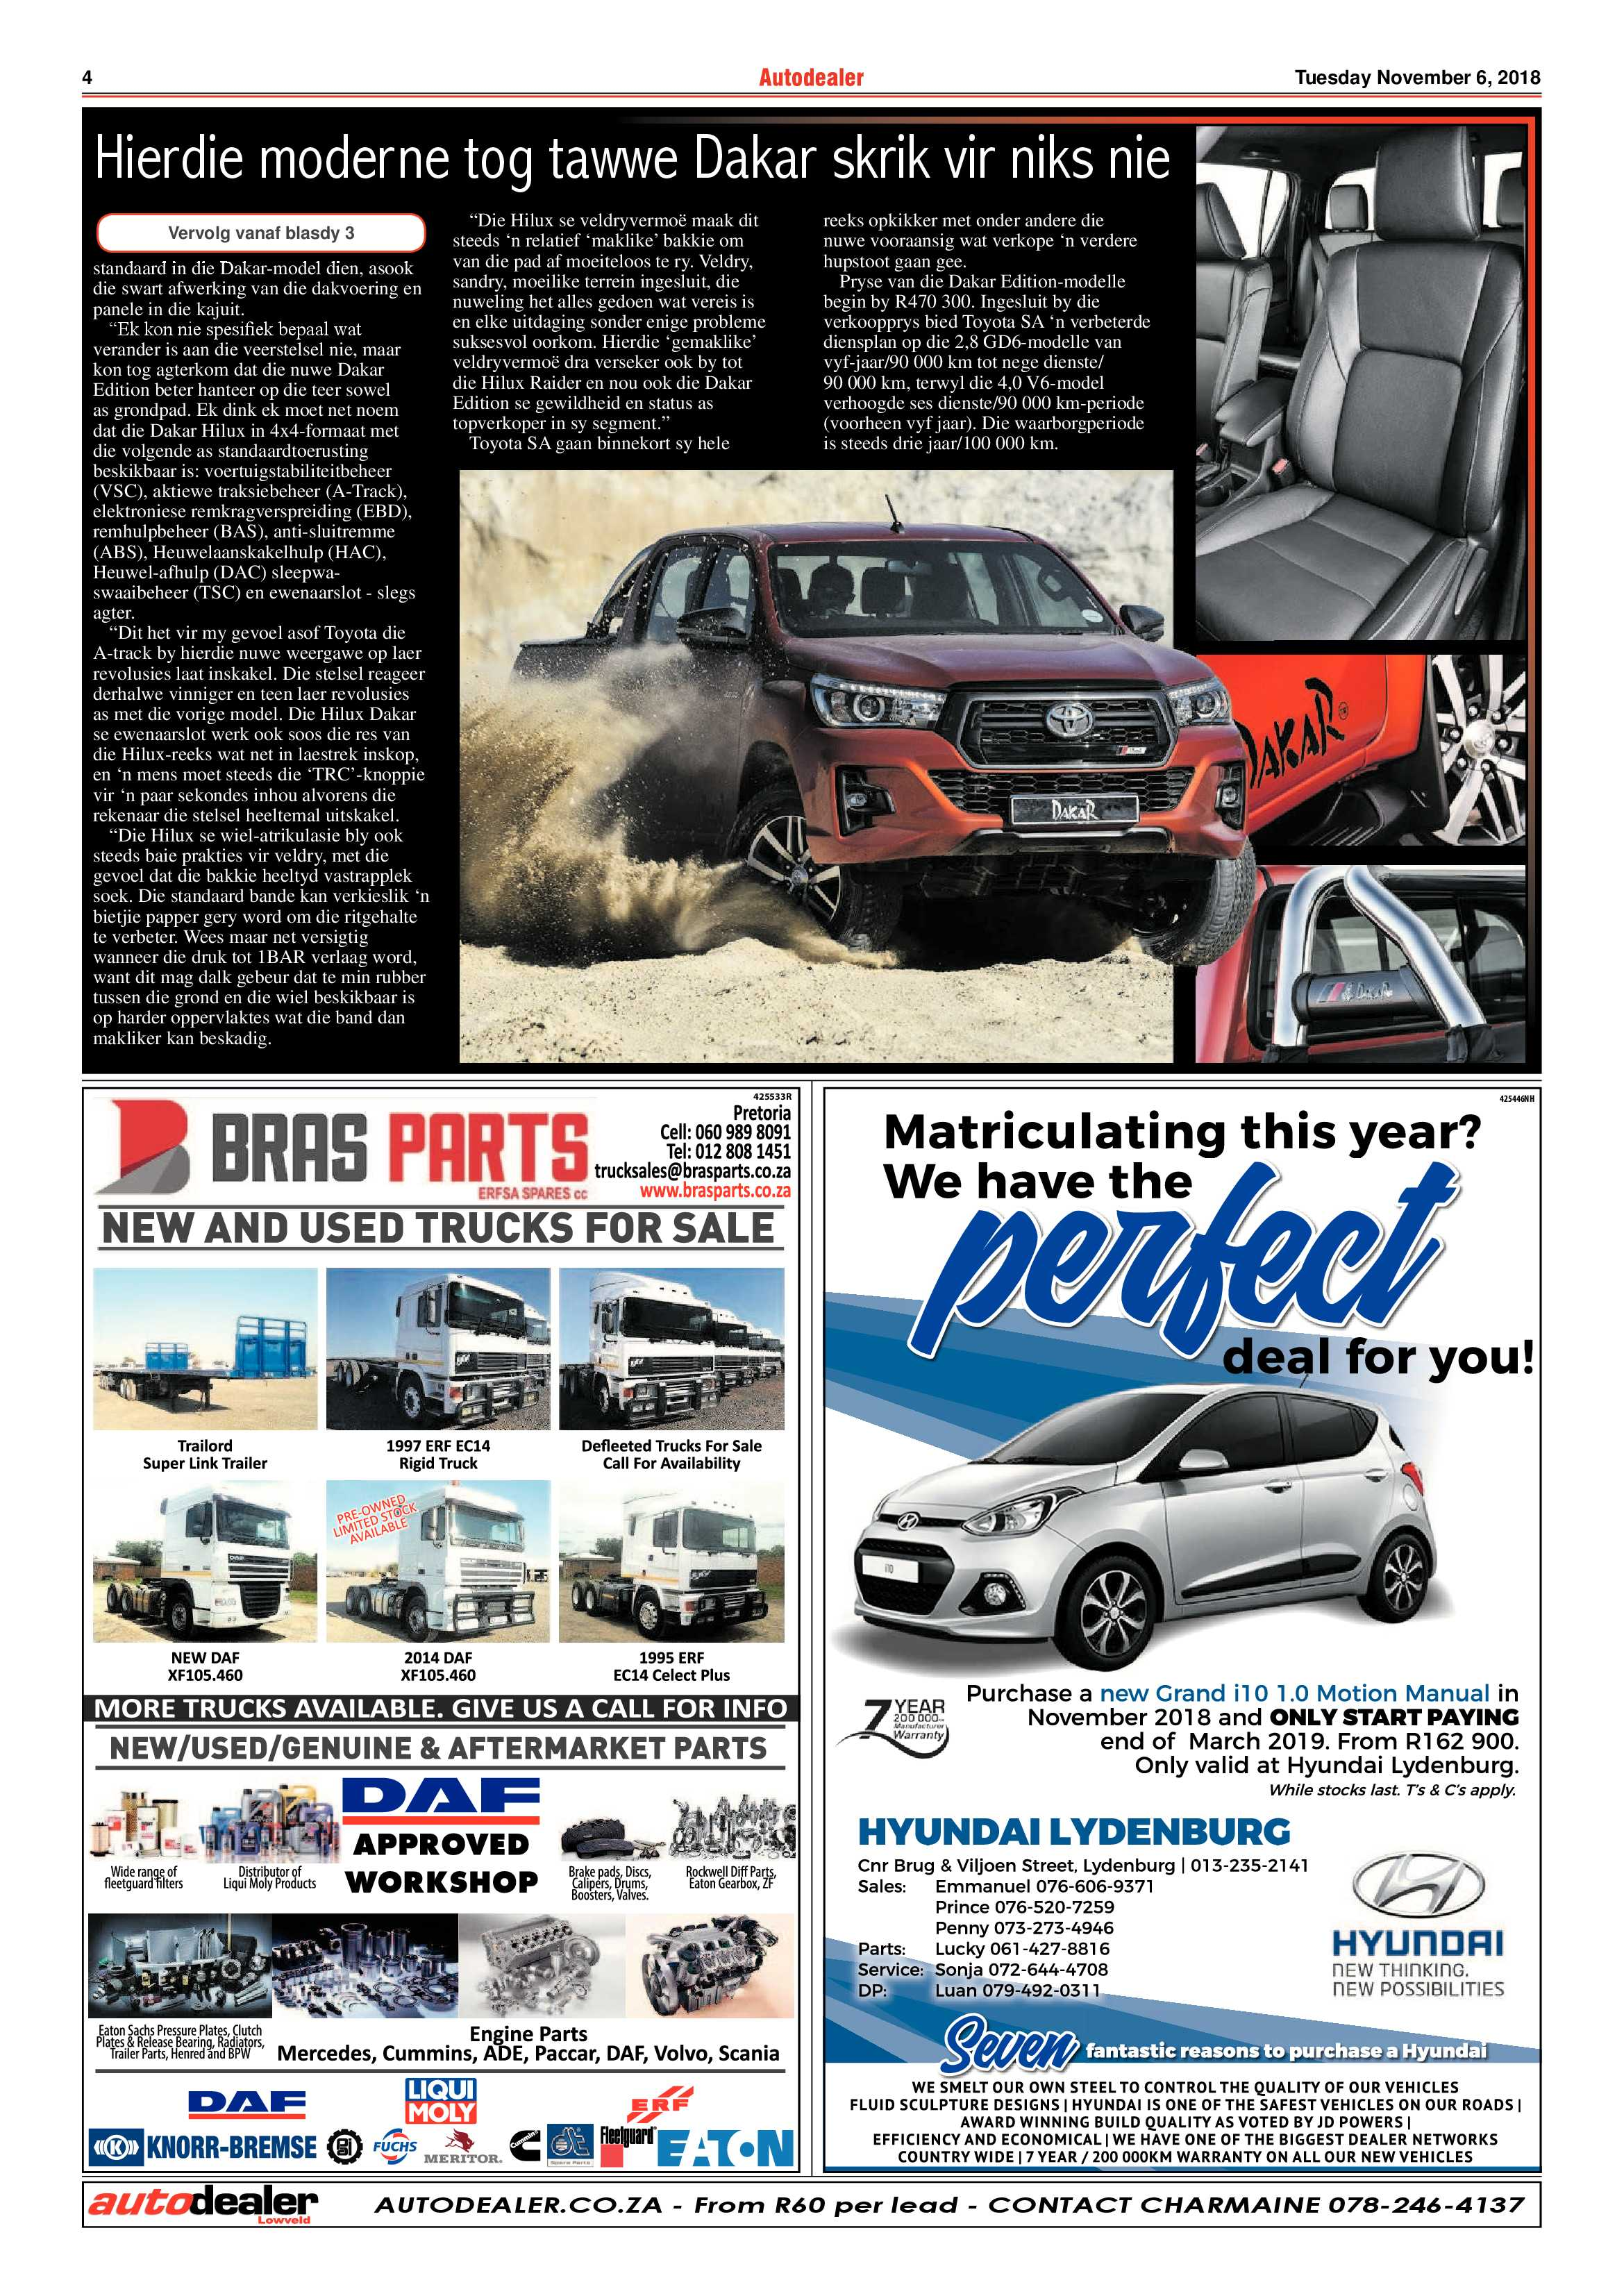 autodealer-6-november-2018-epapers-page-4